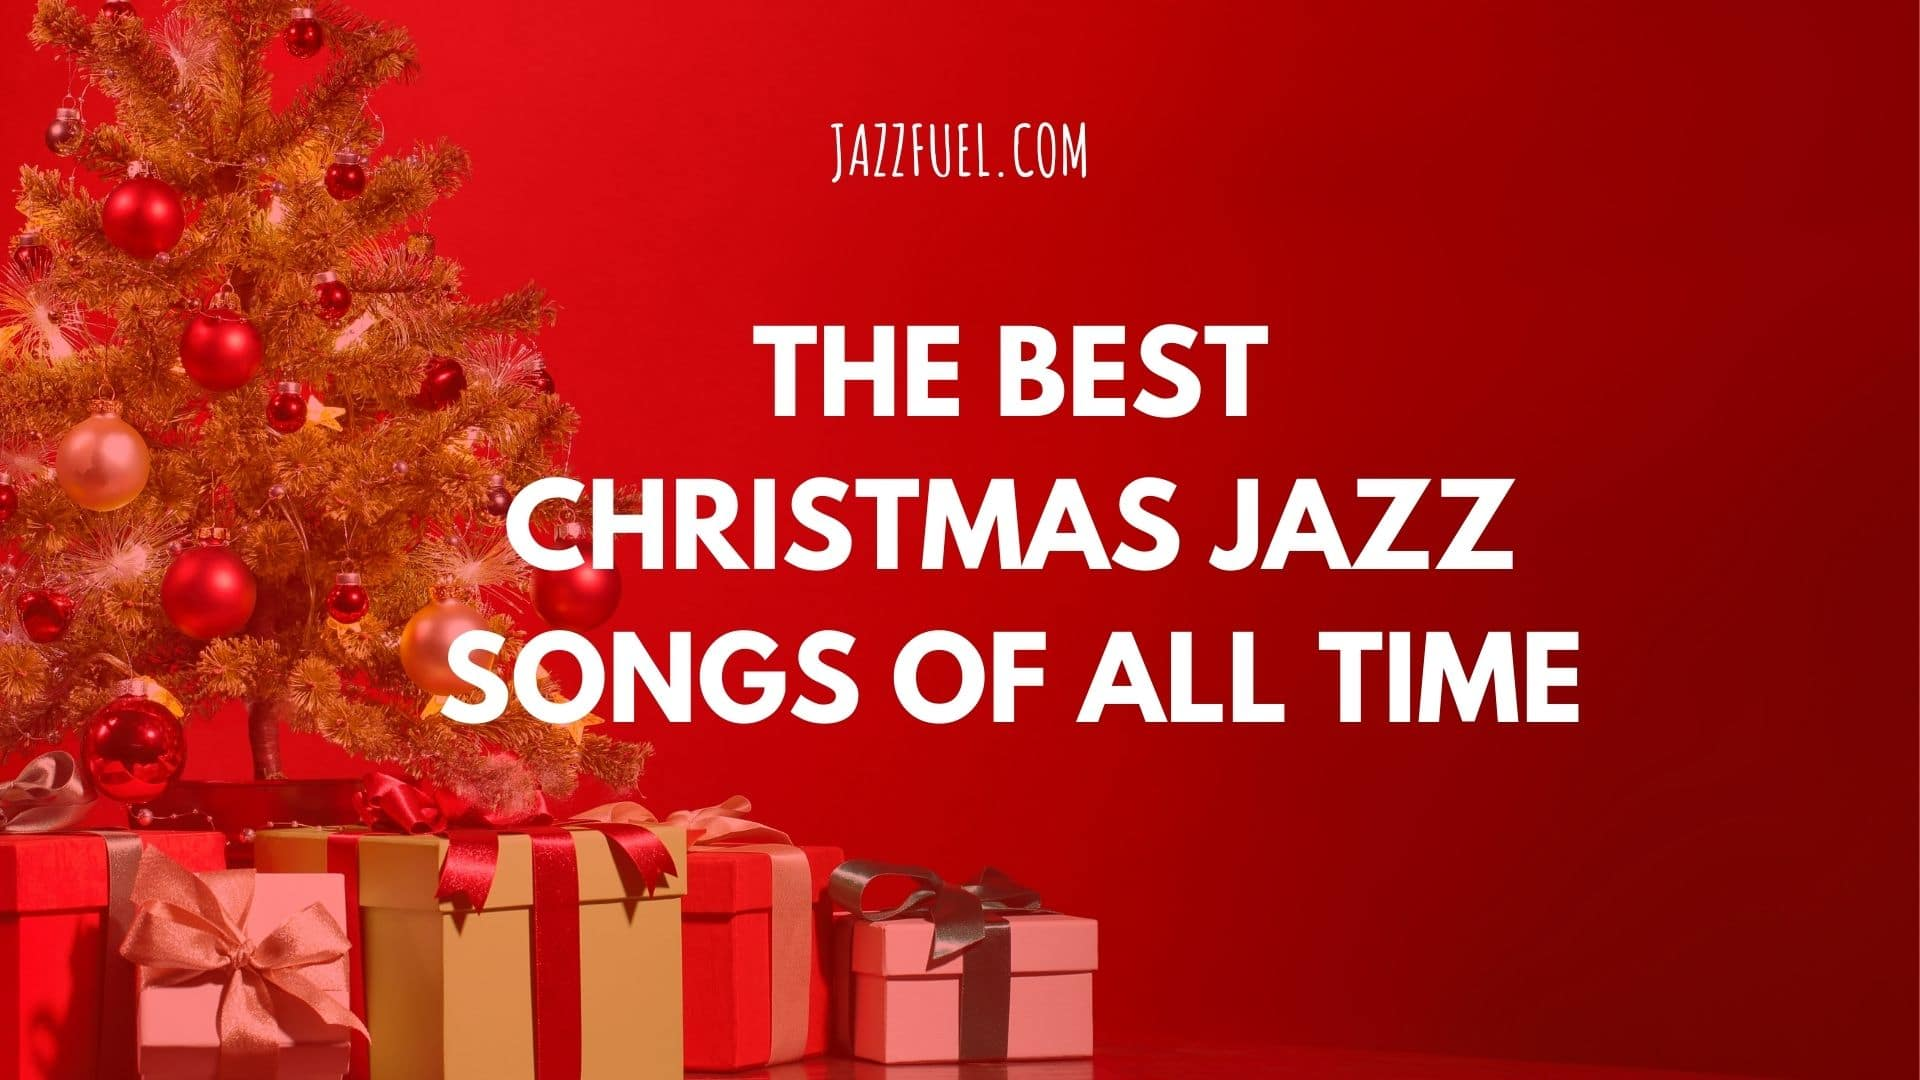 Christmas Jazz Music 10 Of The Best Xmas Songs